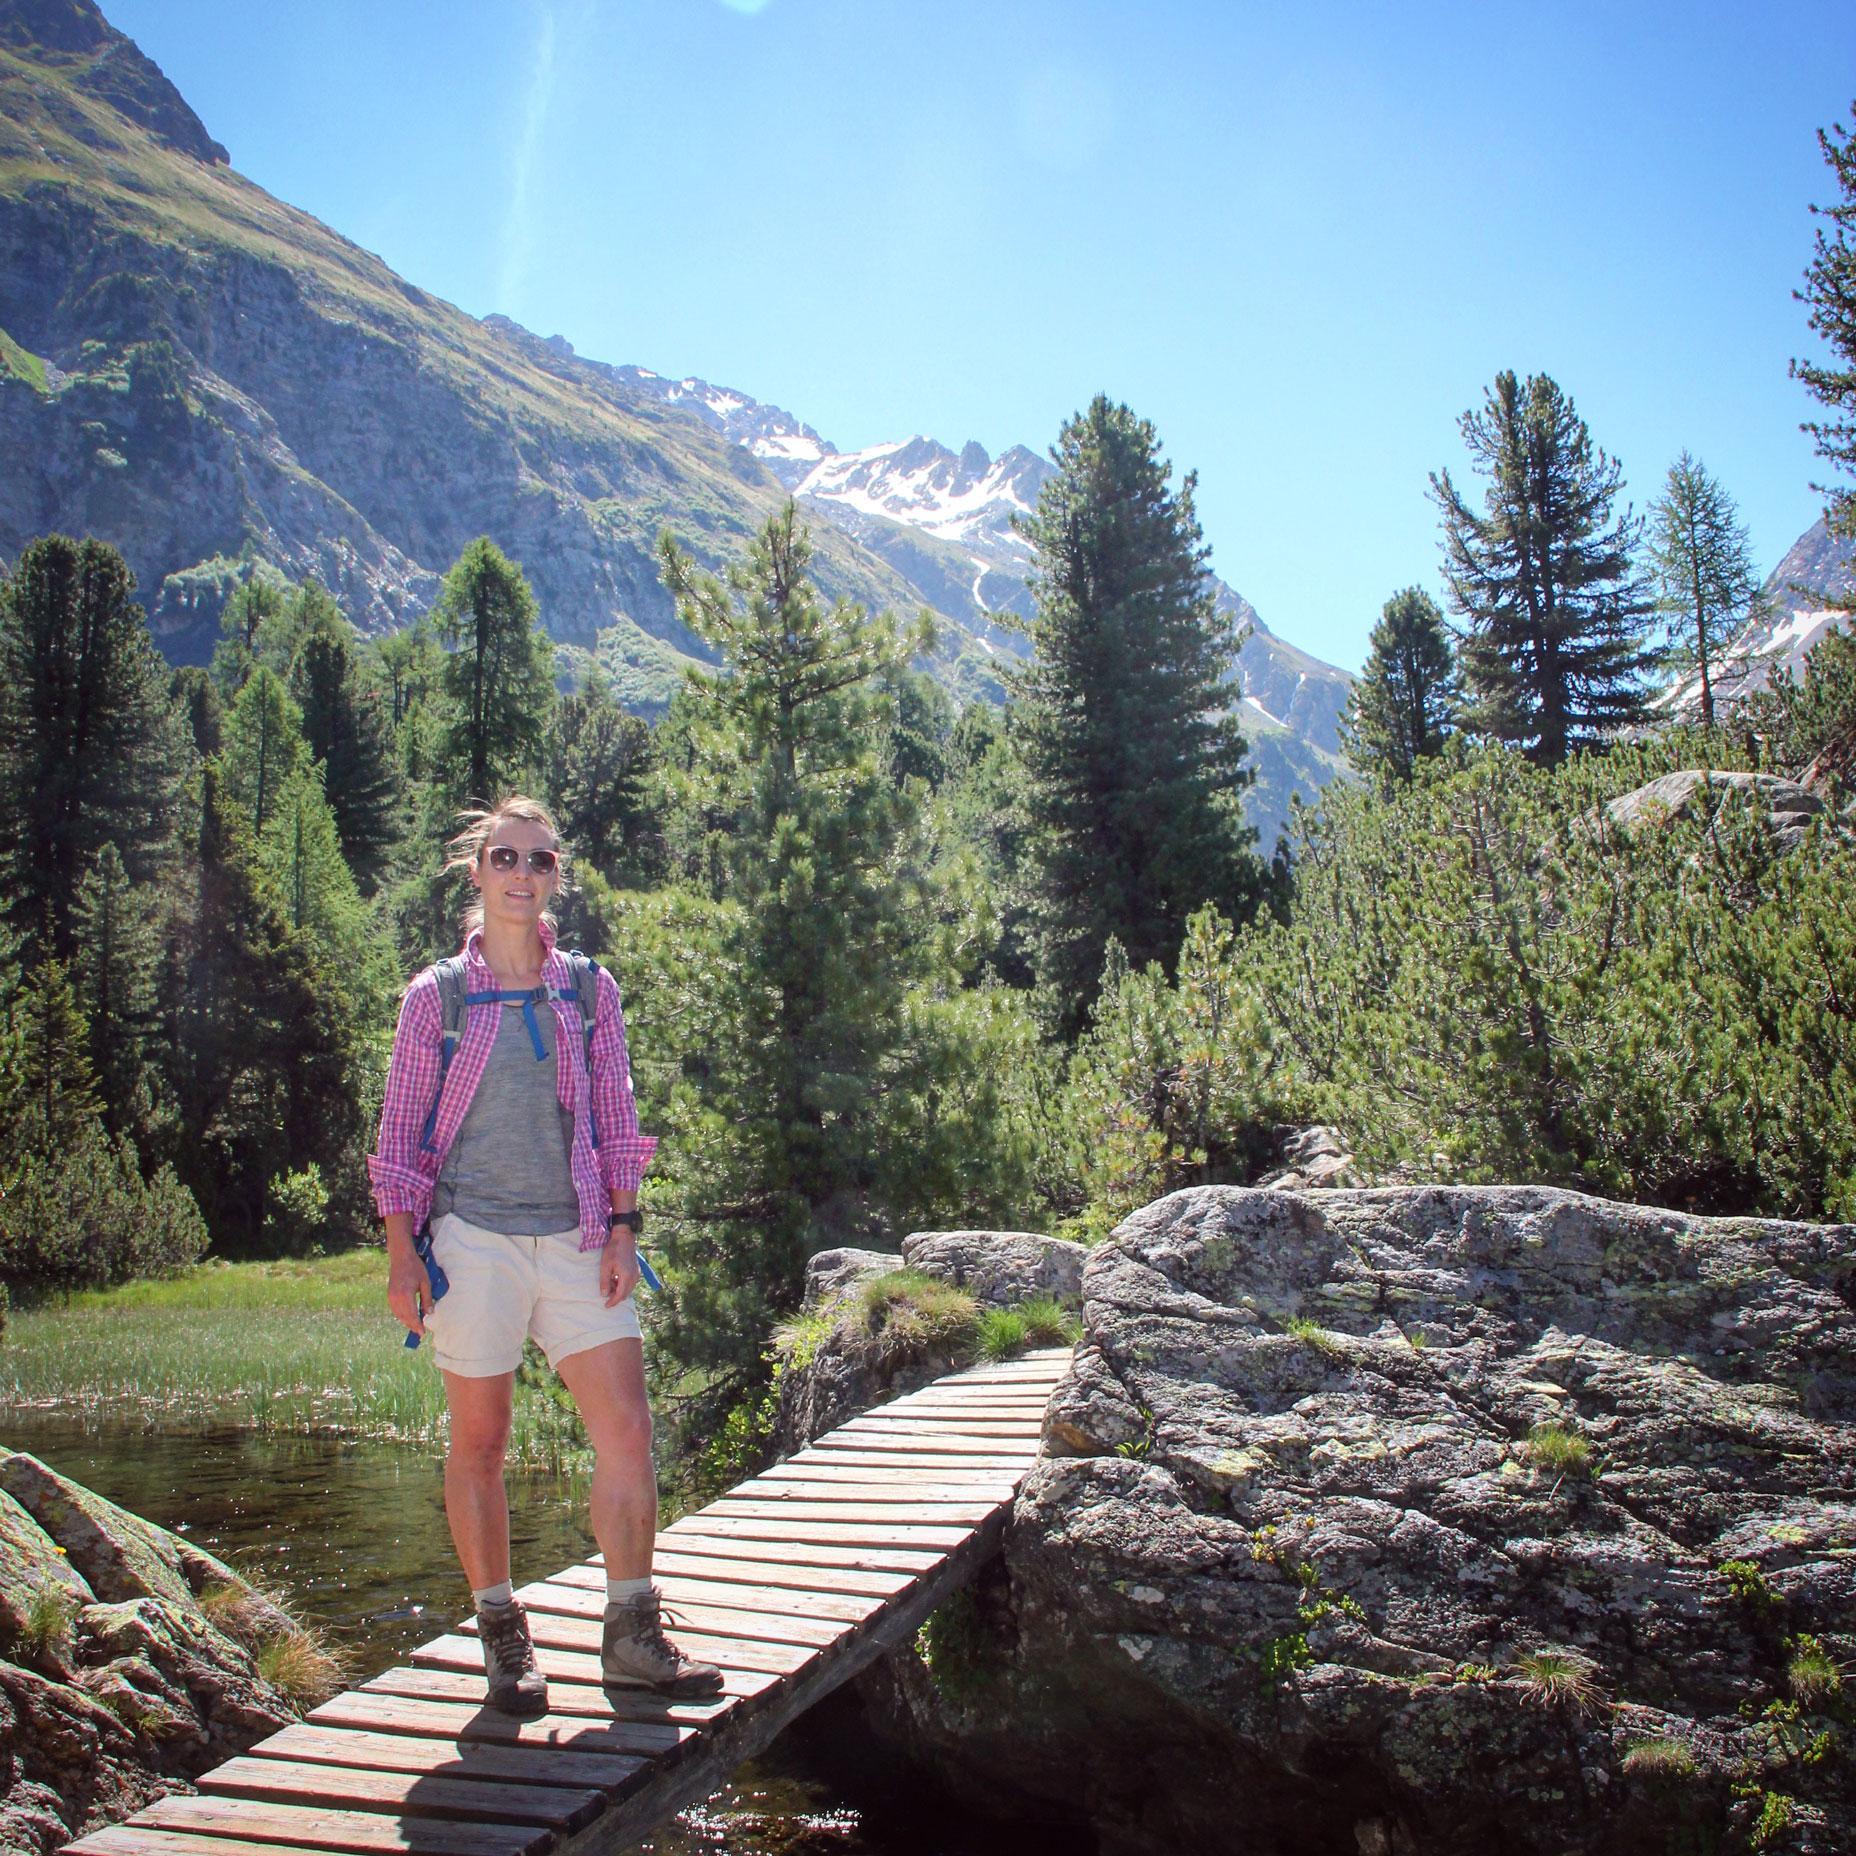 munichmountaingirls-berg-blog-frauen-julia-topp-wandern-hochtour-bernina-runde-lägh-da-cavloc-passo-del-muretto